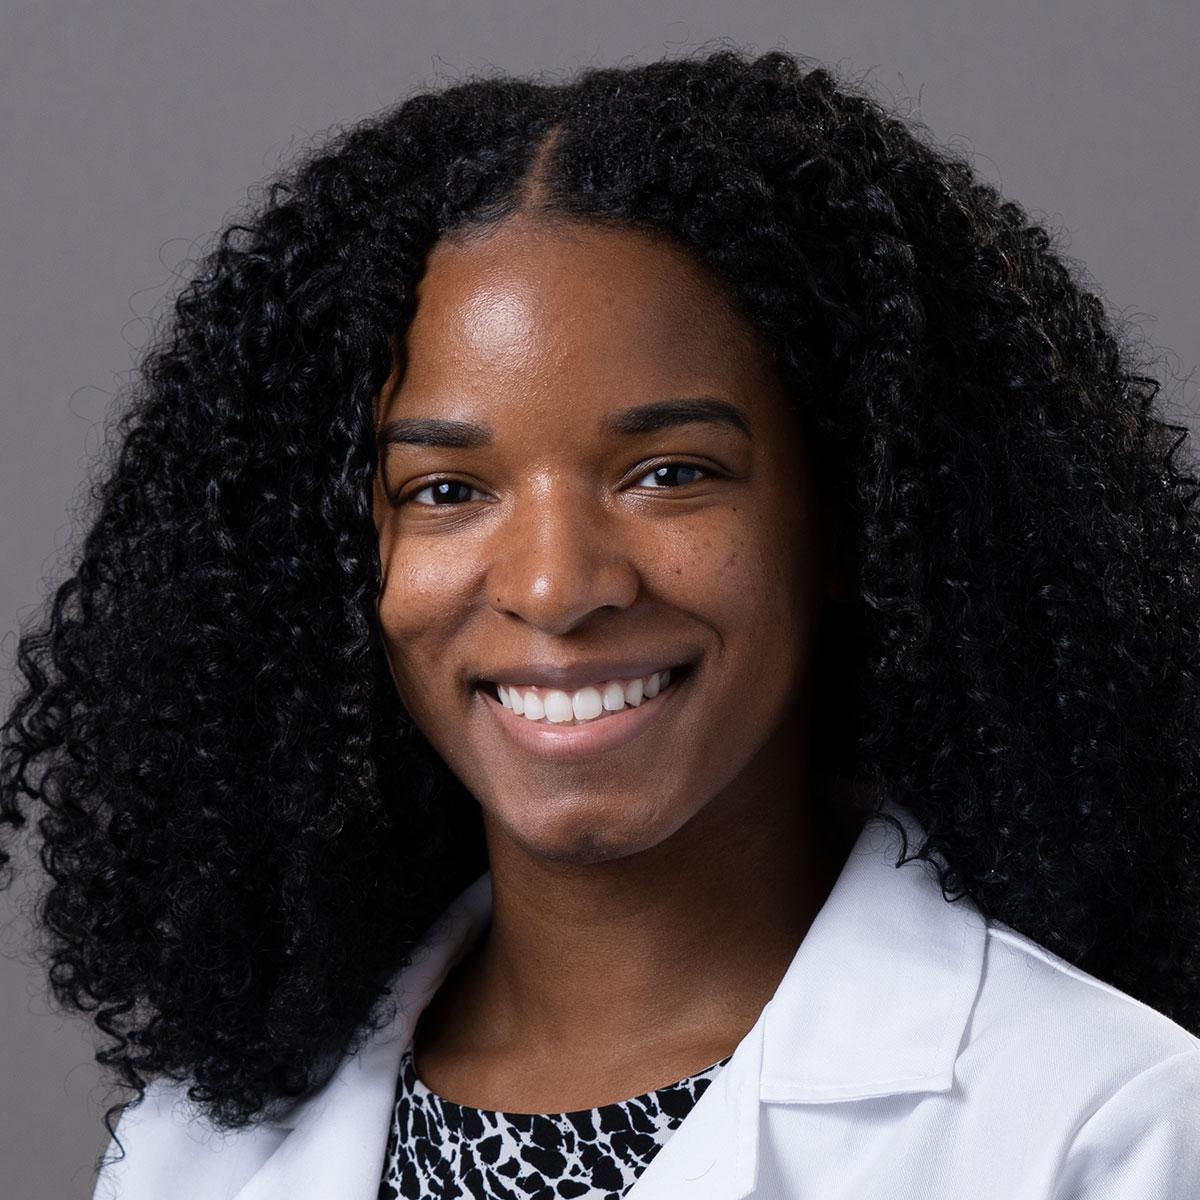 A friendly headshot of Dr. Malika Kelly